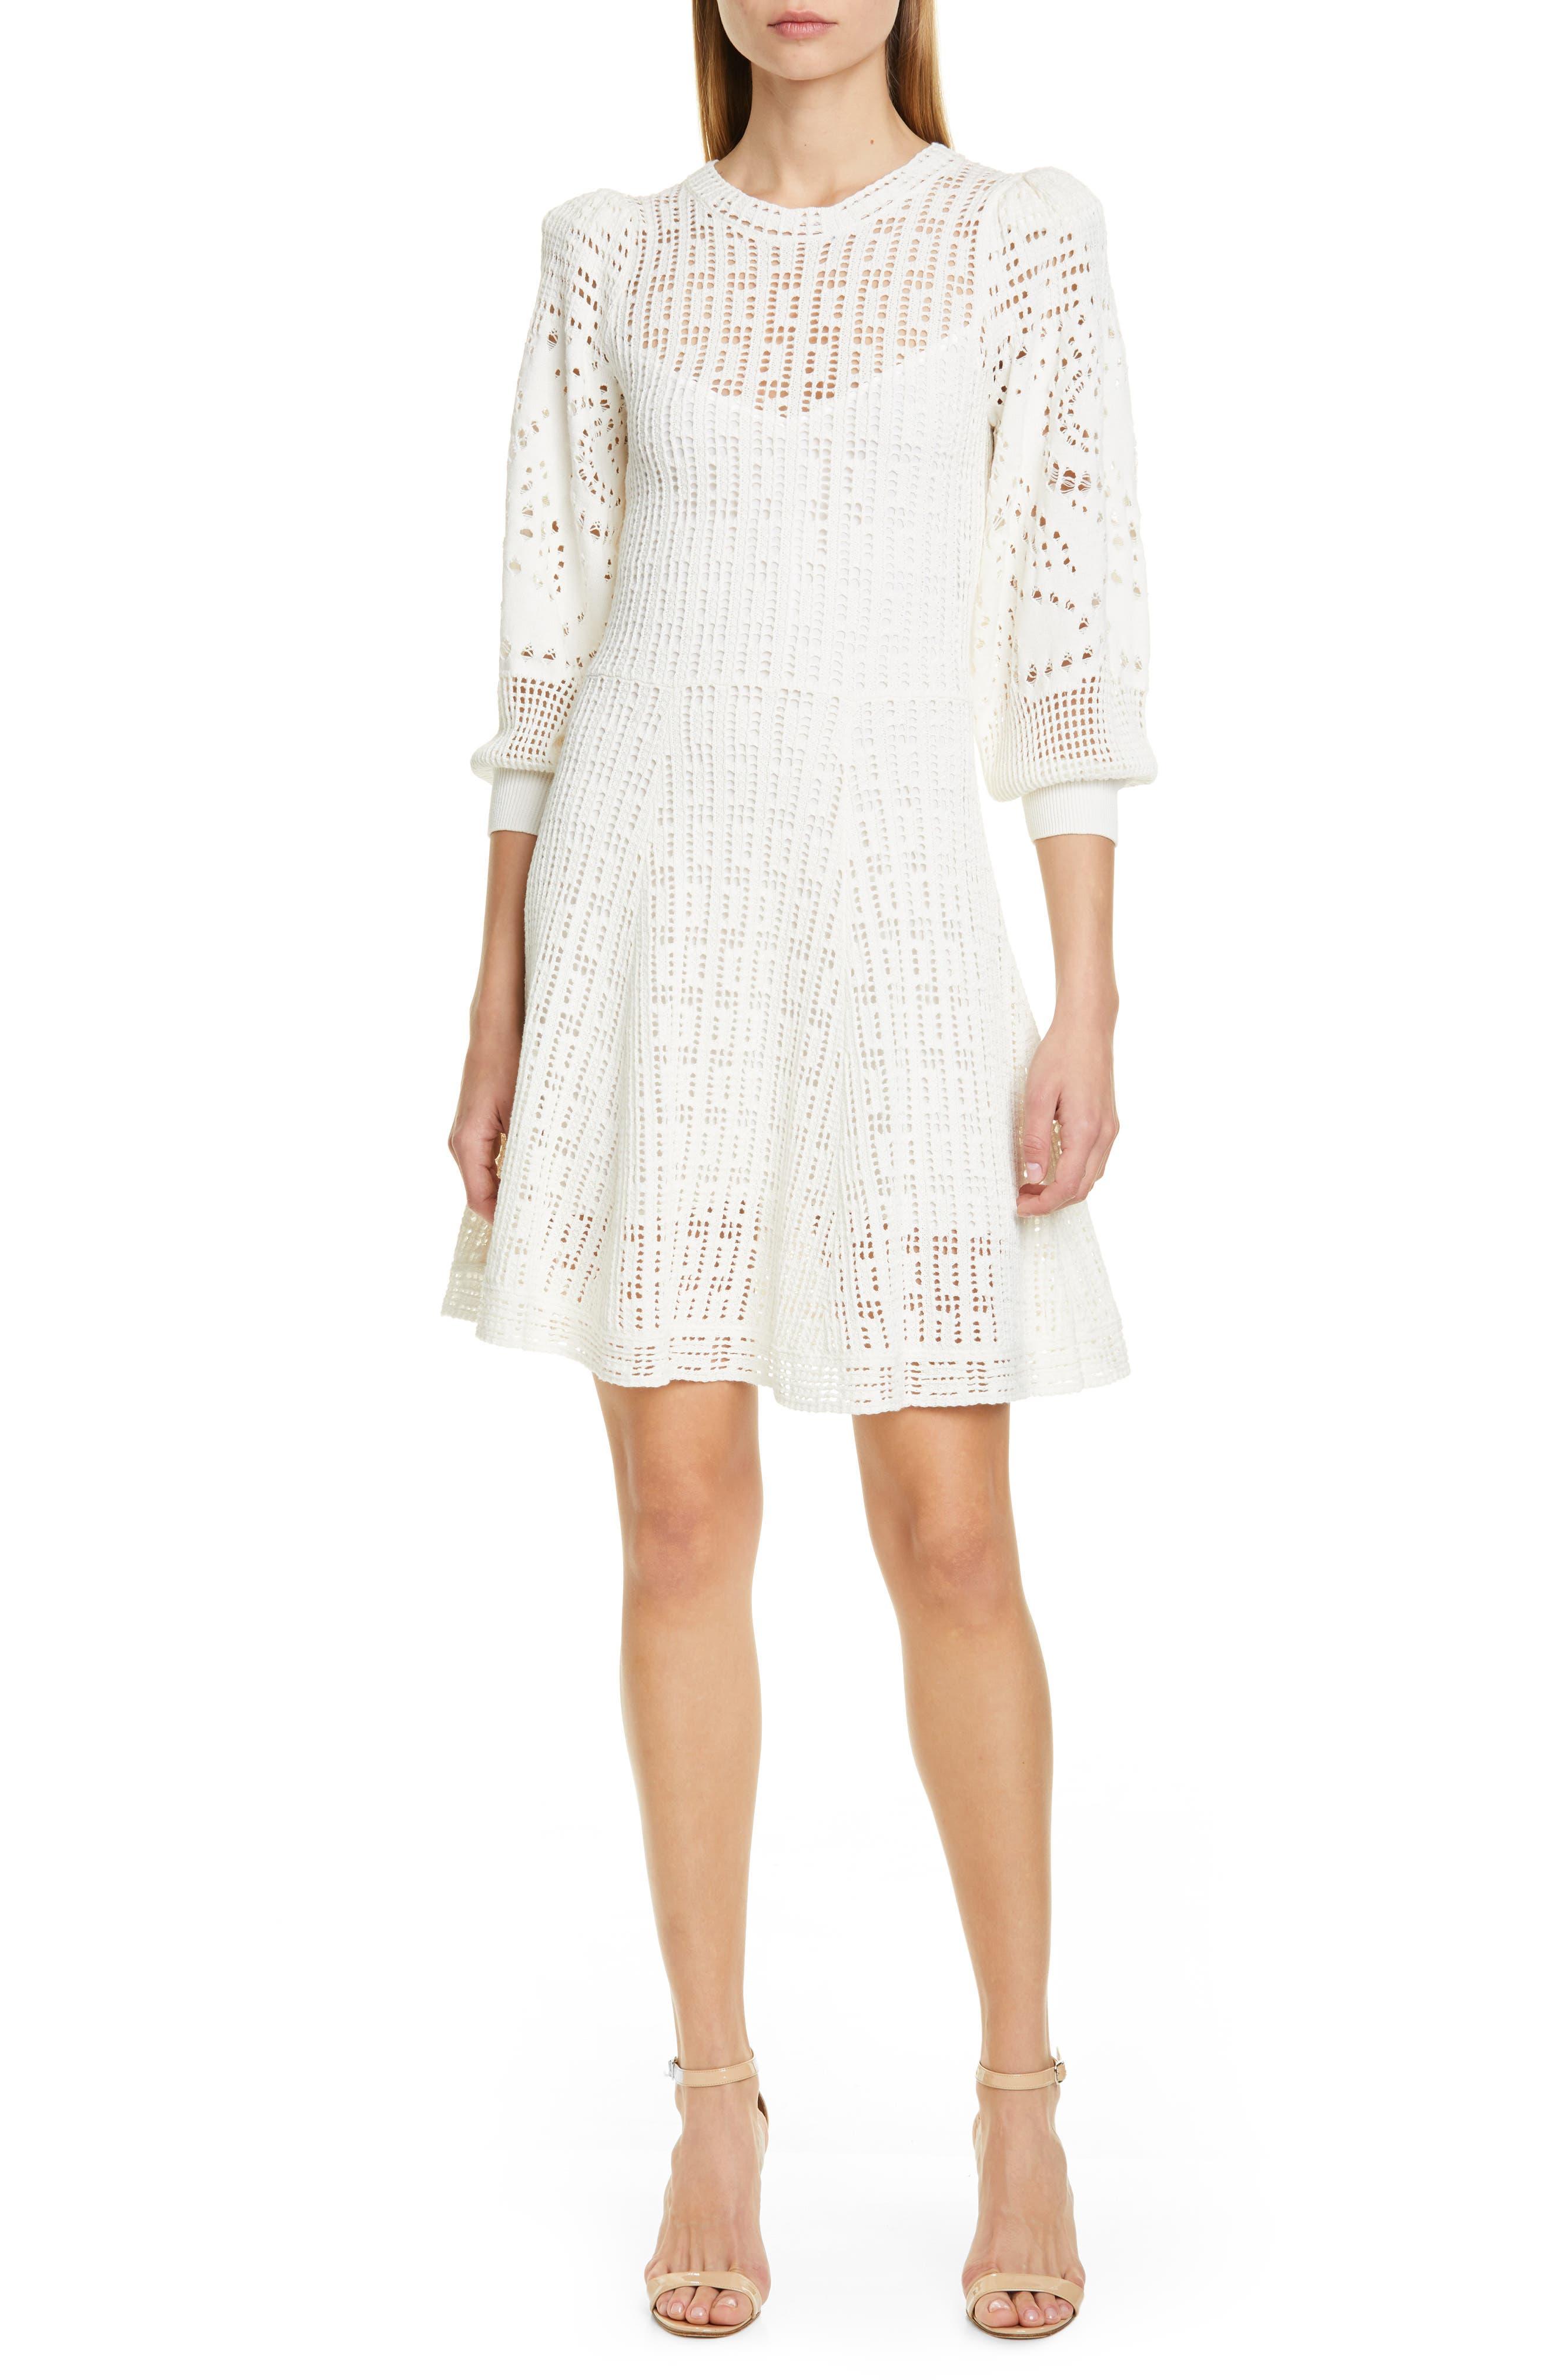 A.l.c. Sofia Fit & Flare Sweaterdress, White